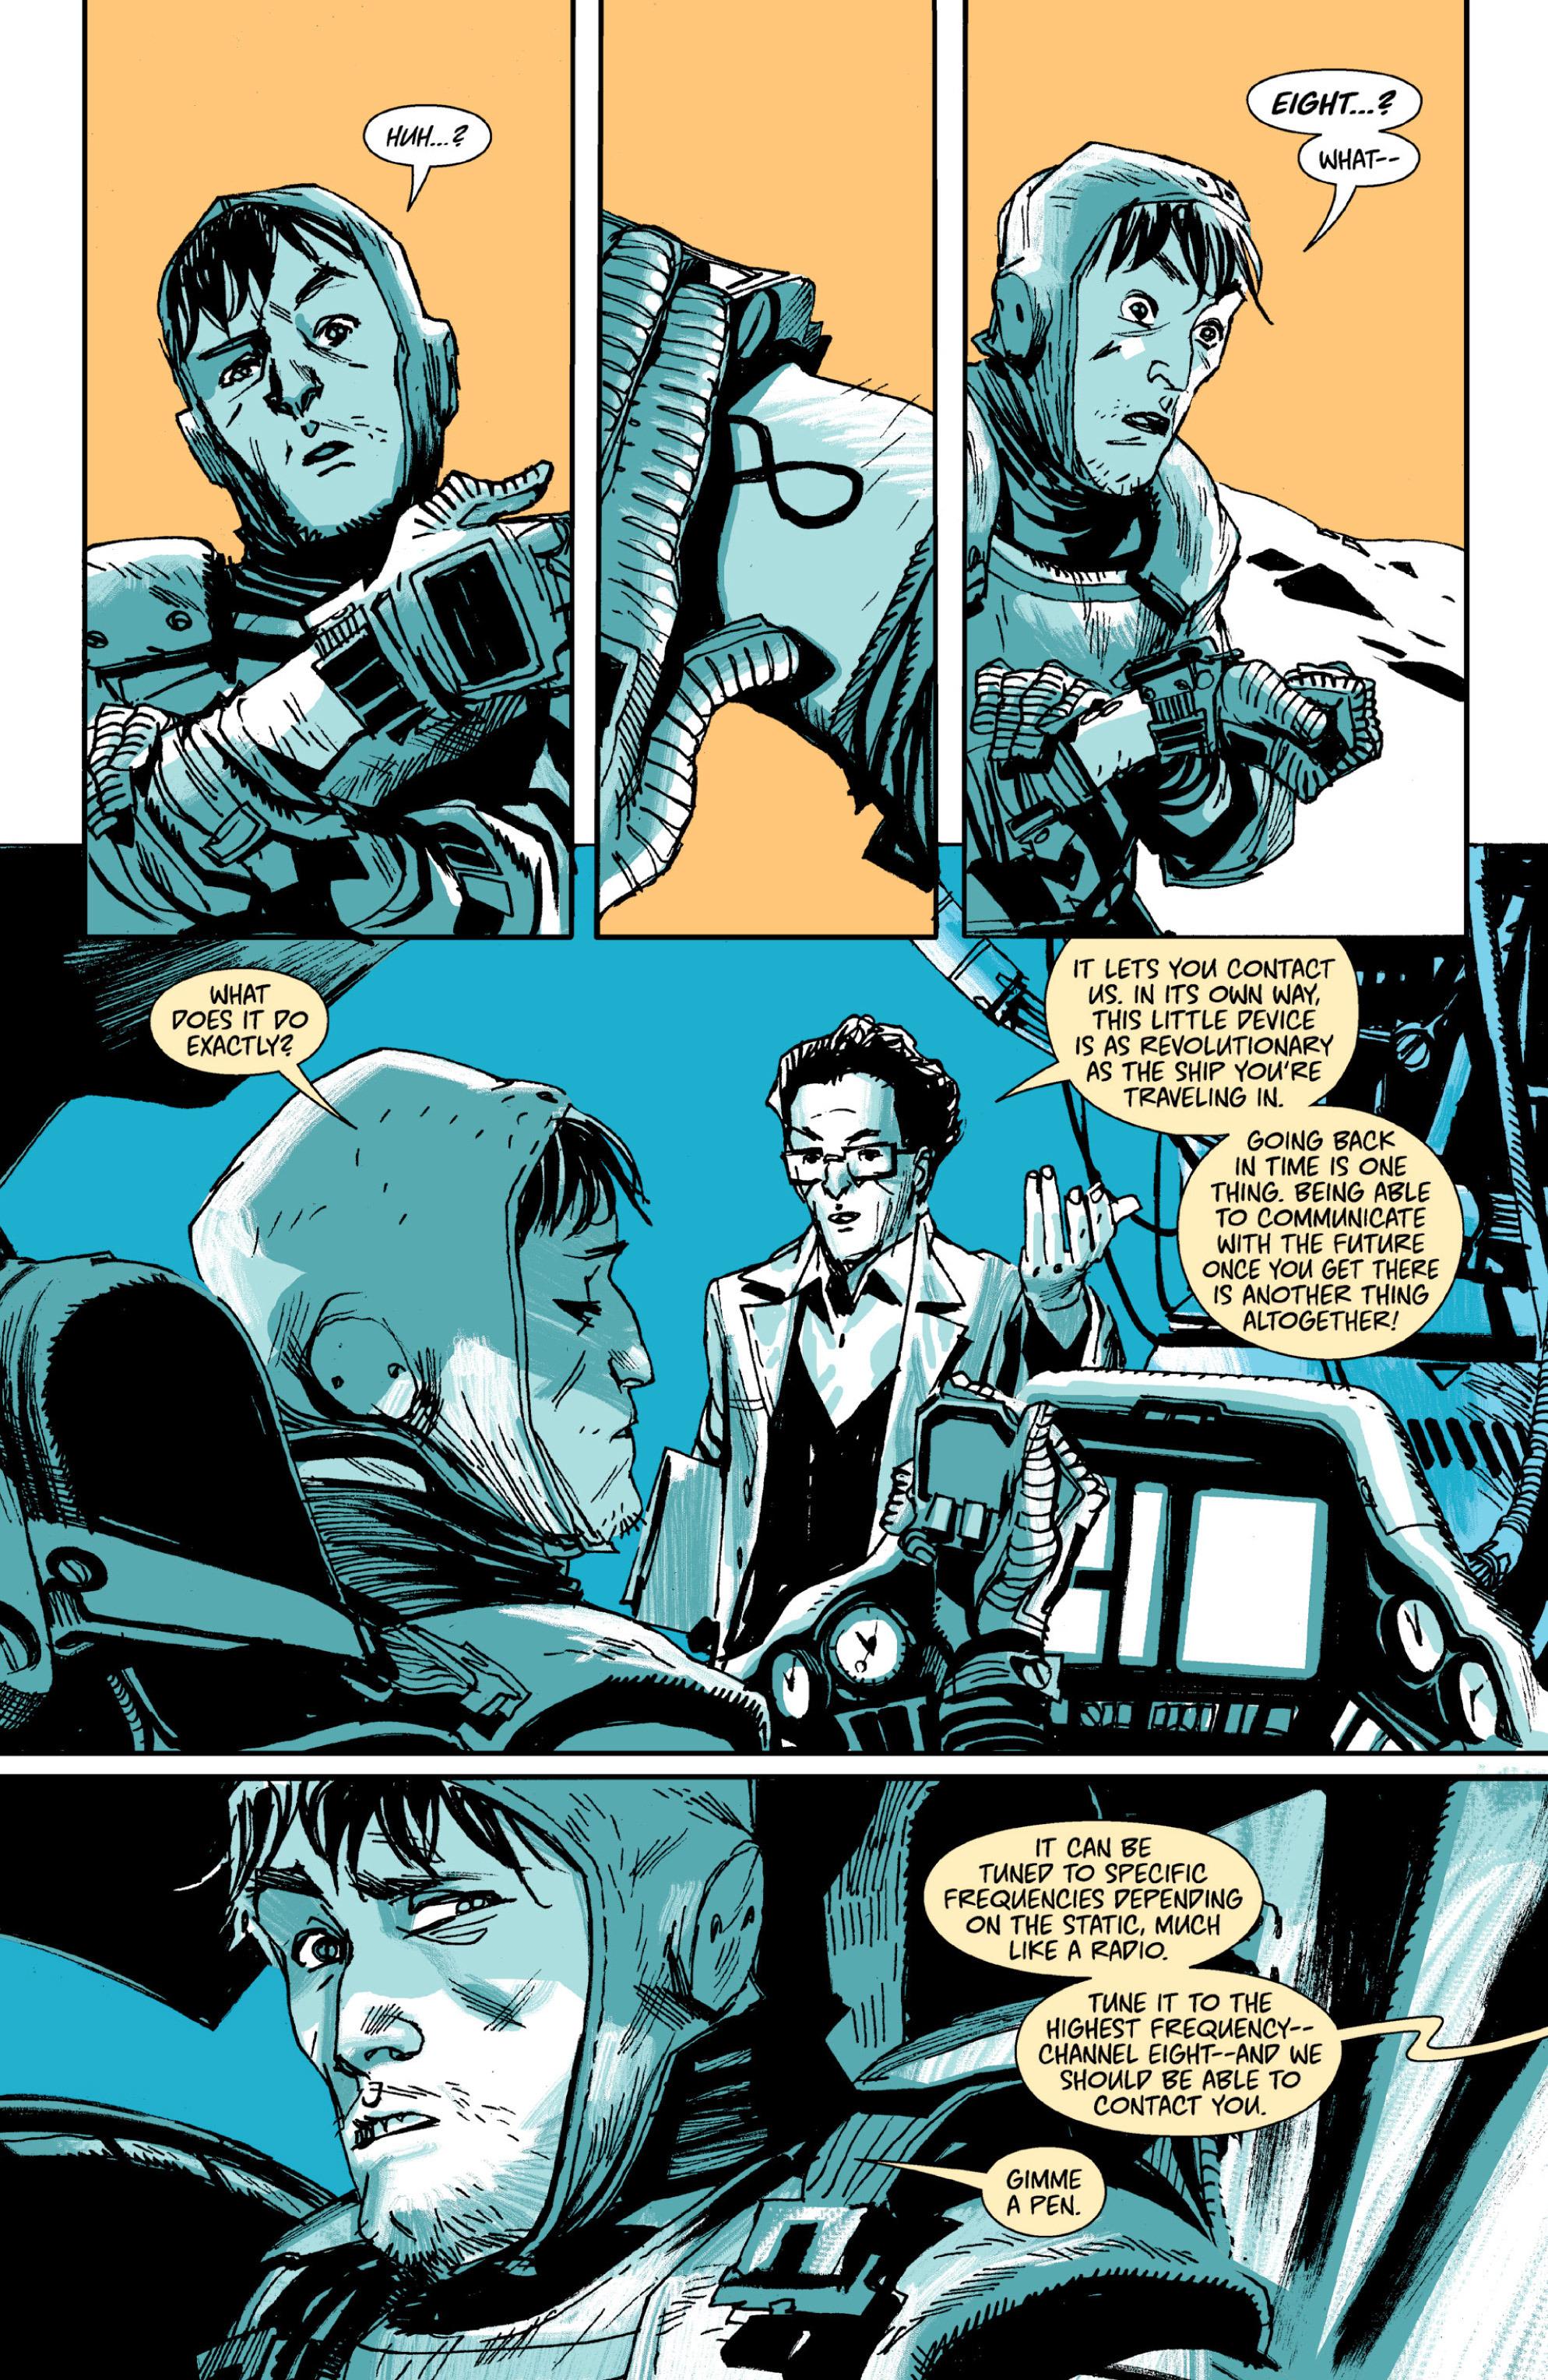 Read online Ei8ht comic -  Issue # TPB - 11